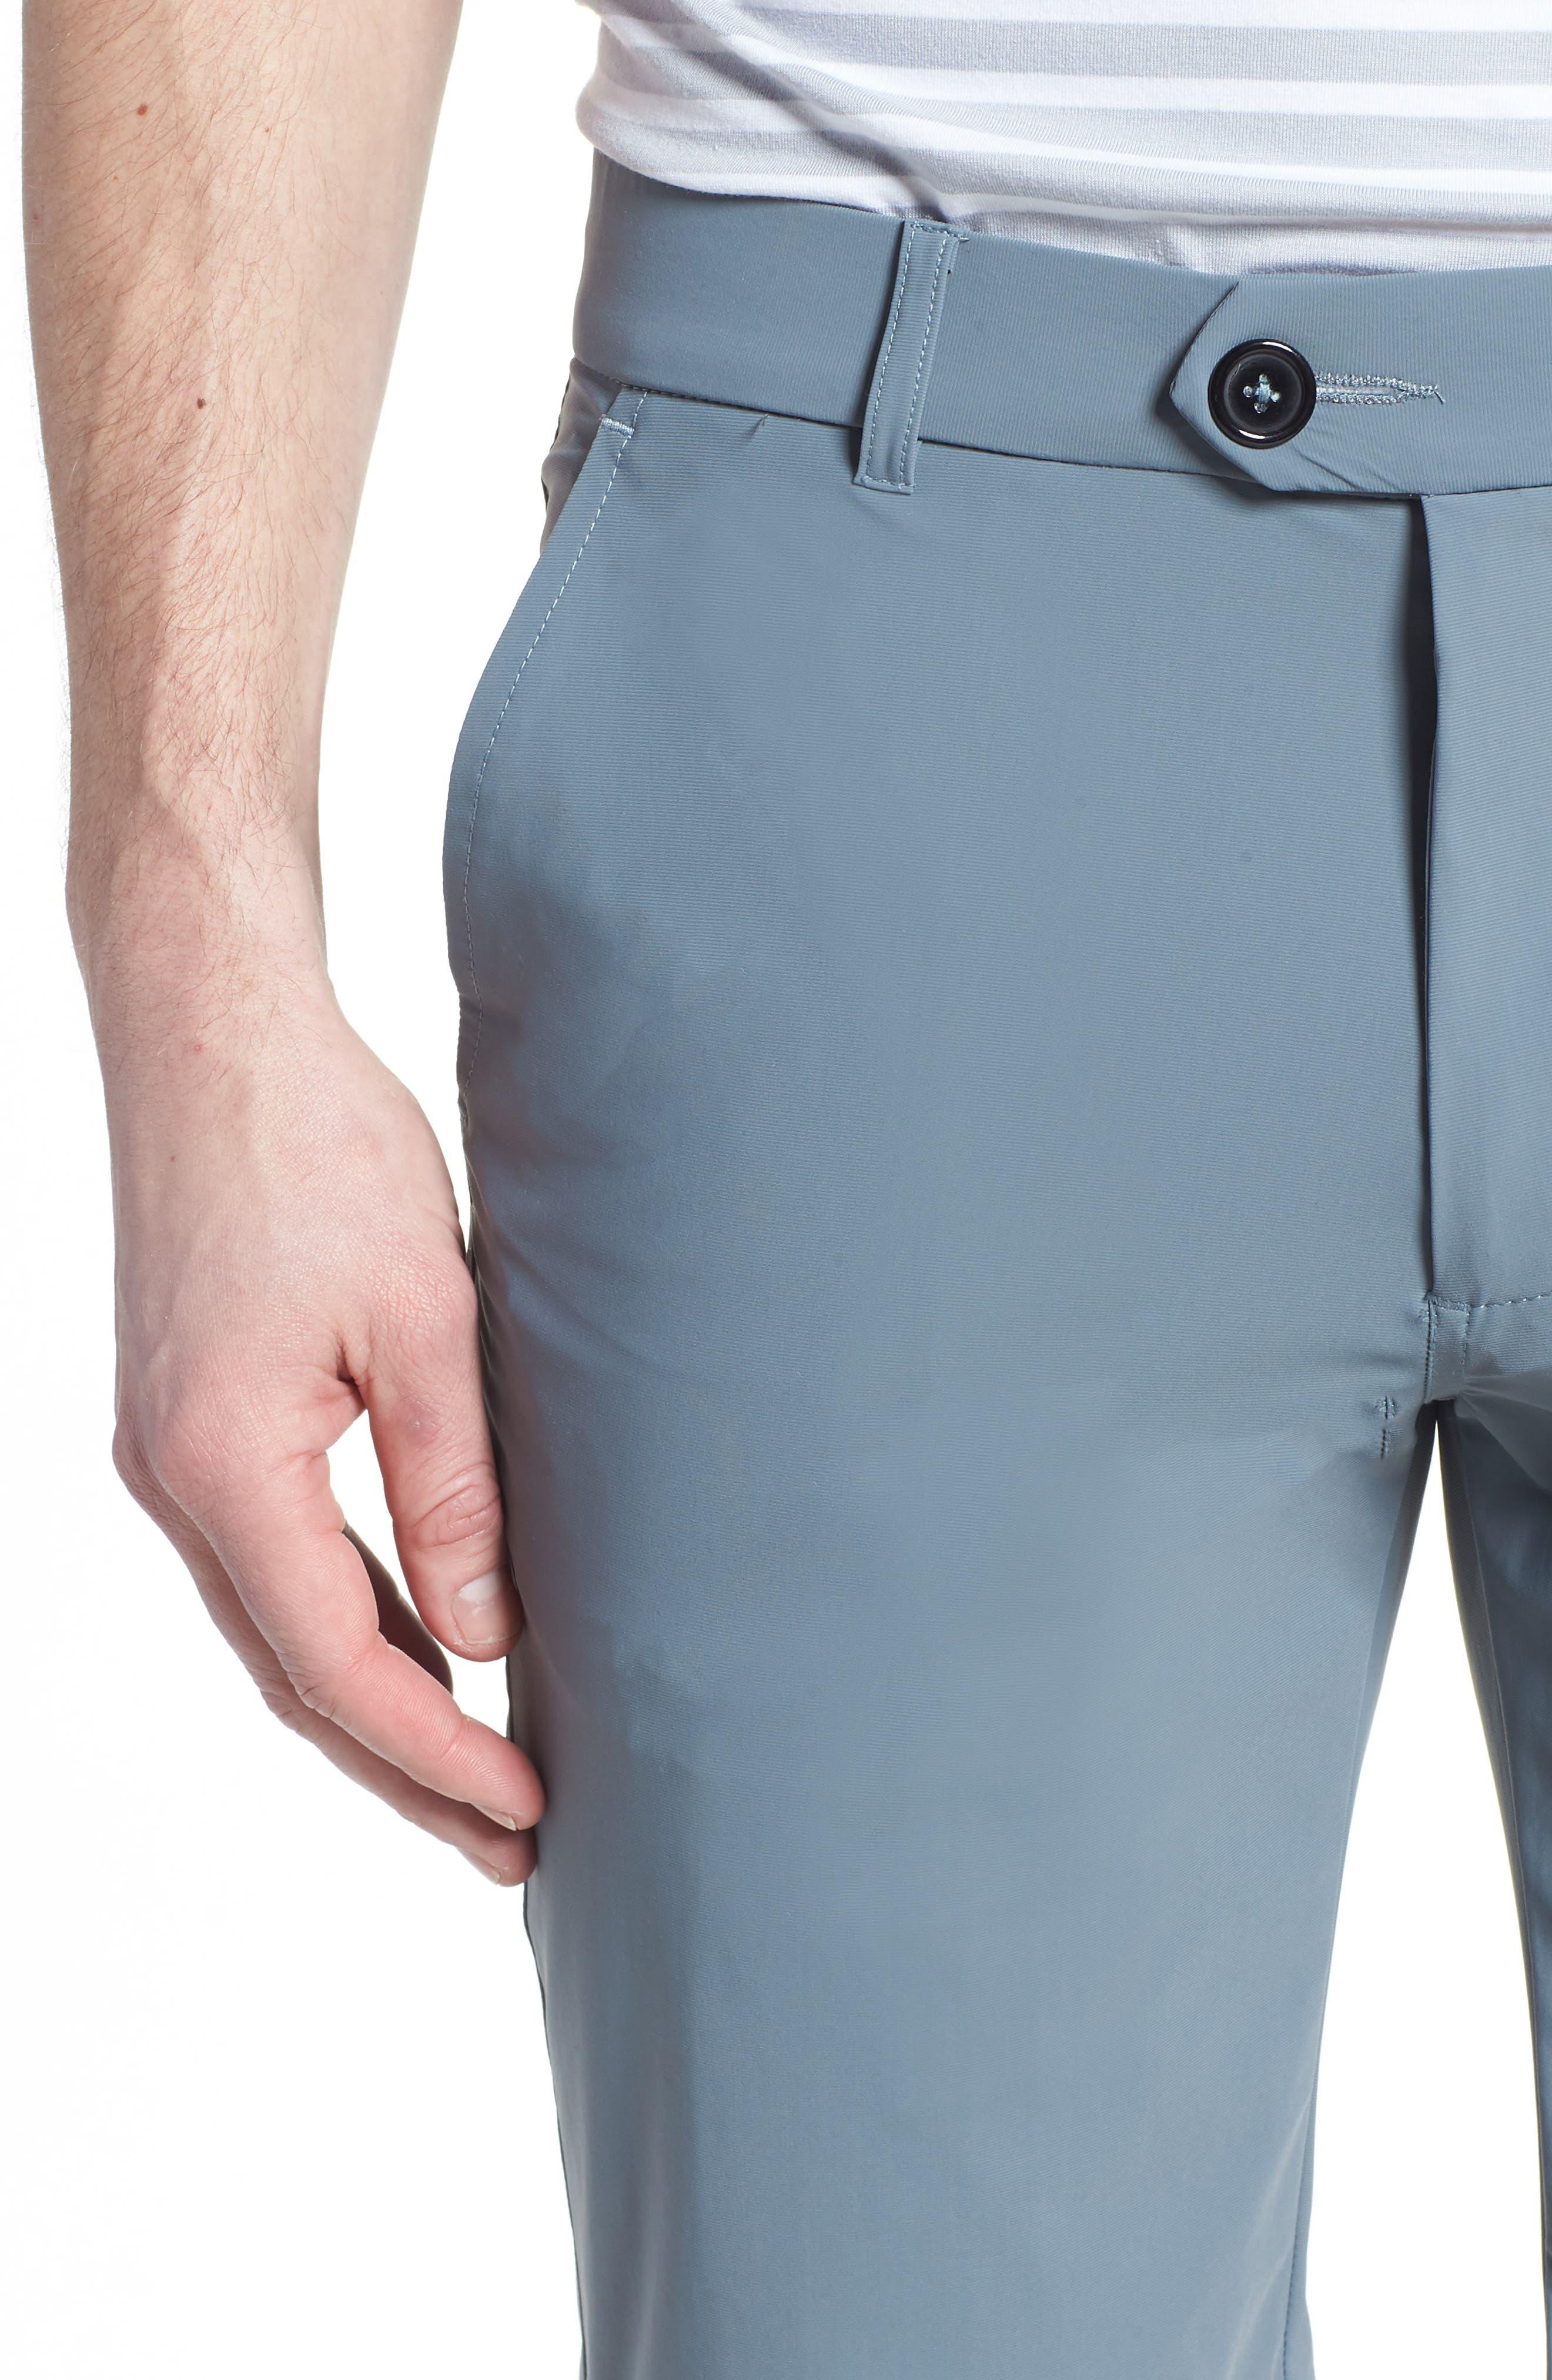 Montauk Shorts,                             Alternate thumbnail 4, color,                             SLATE